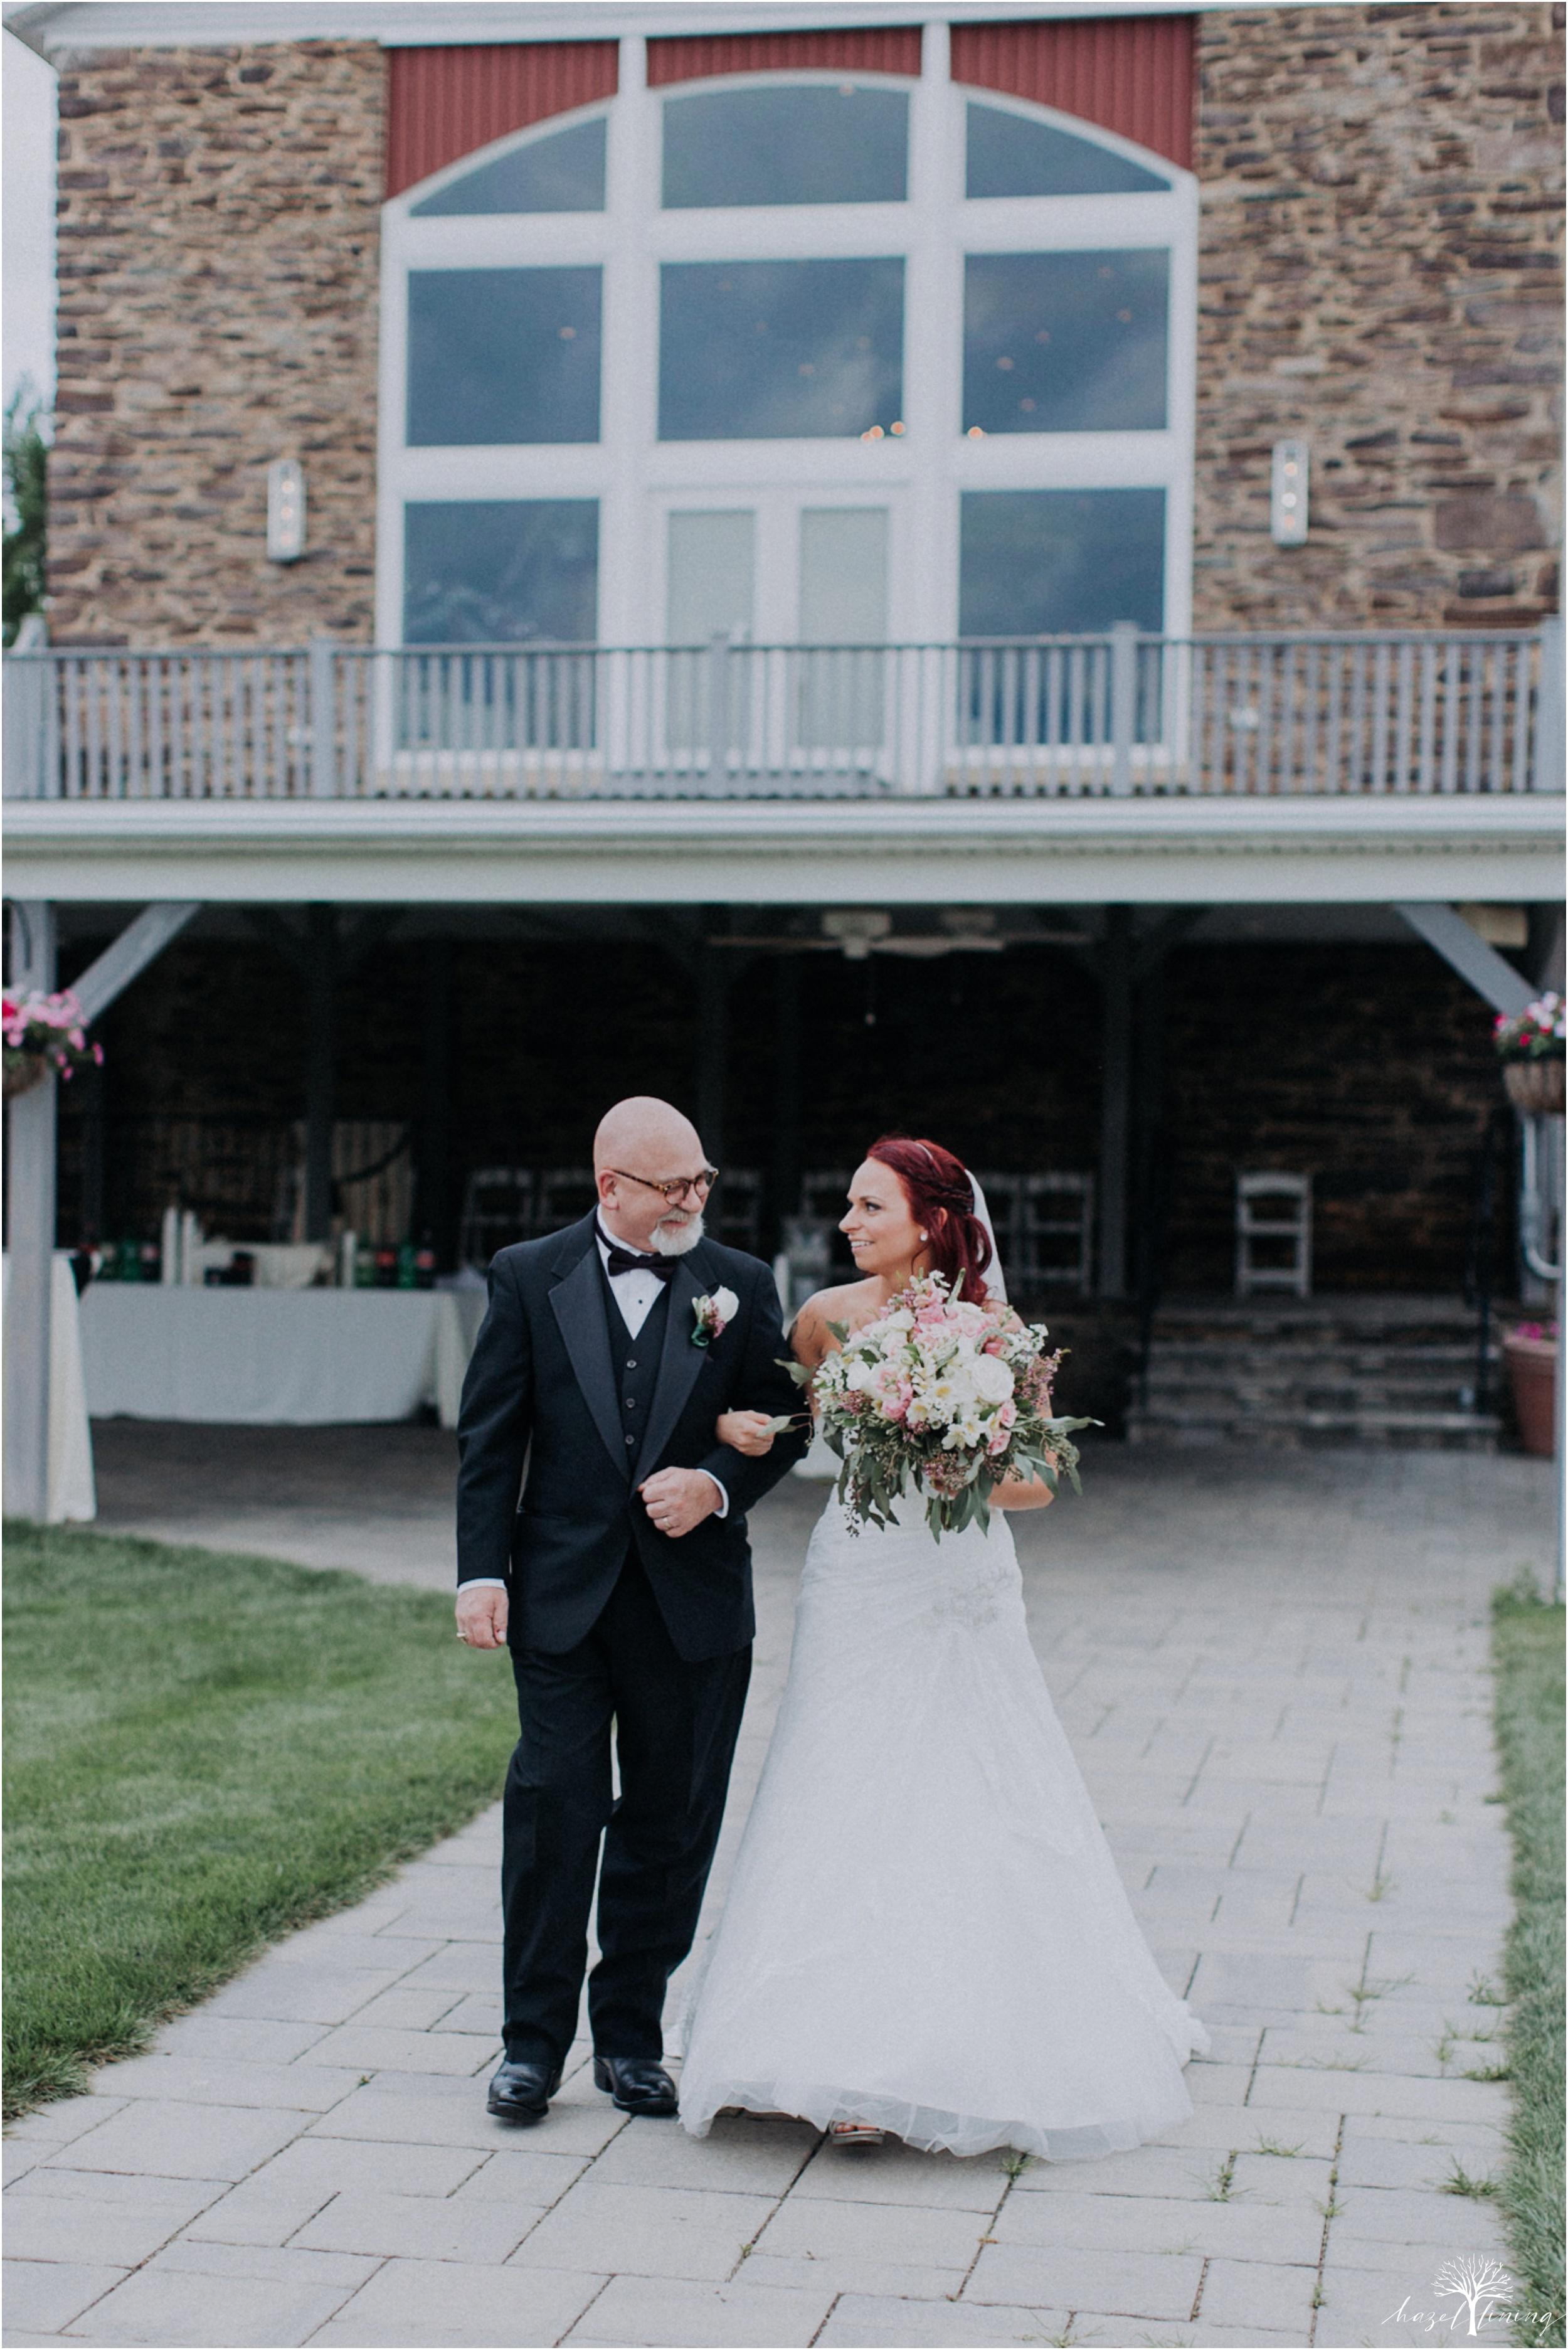 alyssa-james-stiteler-wedding-loft-and-sweet-water-cc-pennsburg-pennsylvania-hazel-lining-travel-wedding-elopement-photography_0049.jpg